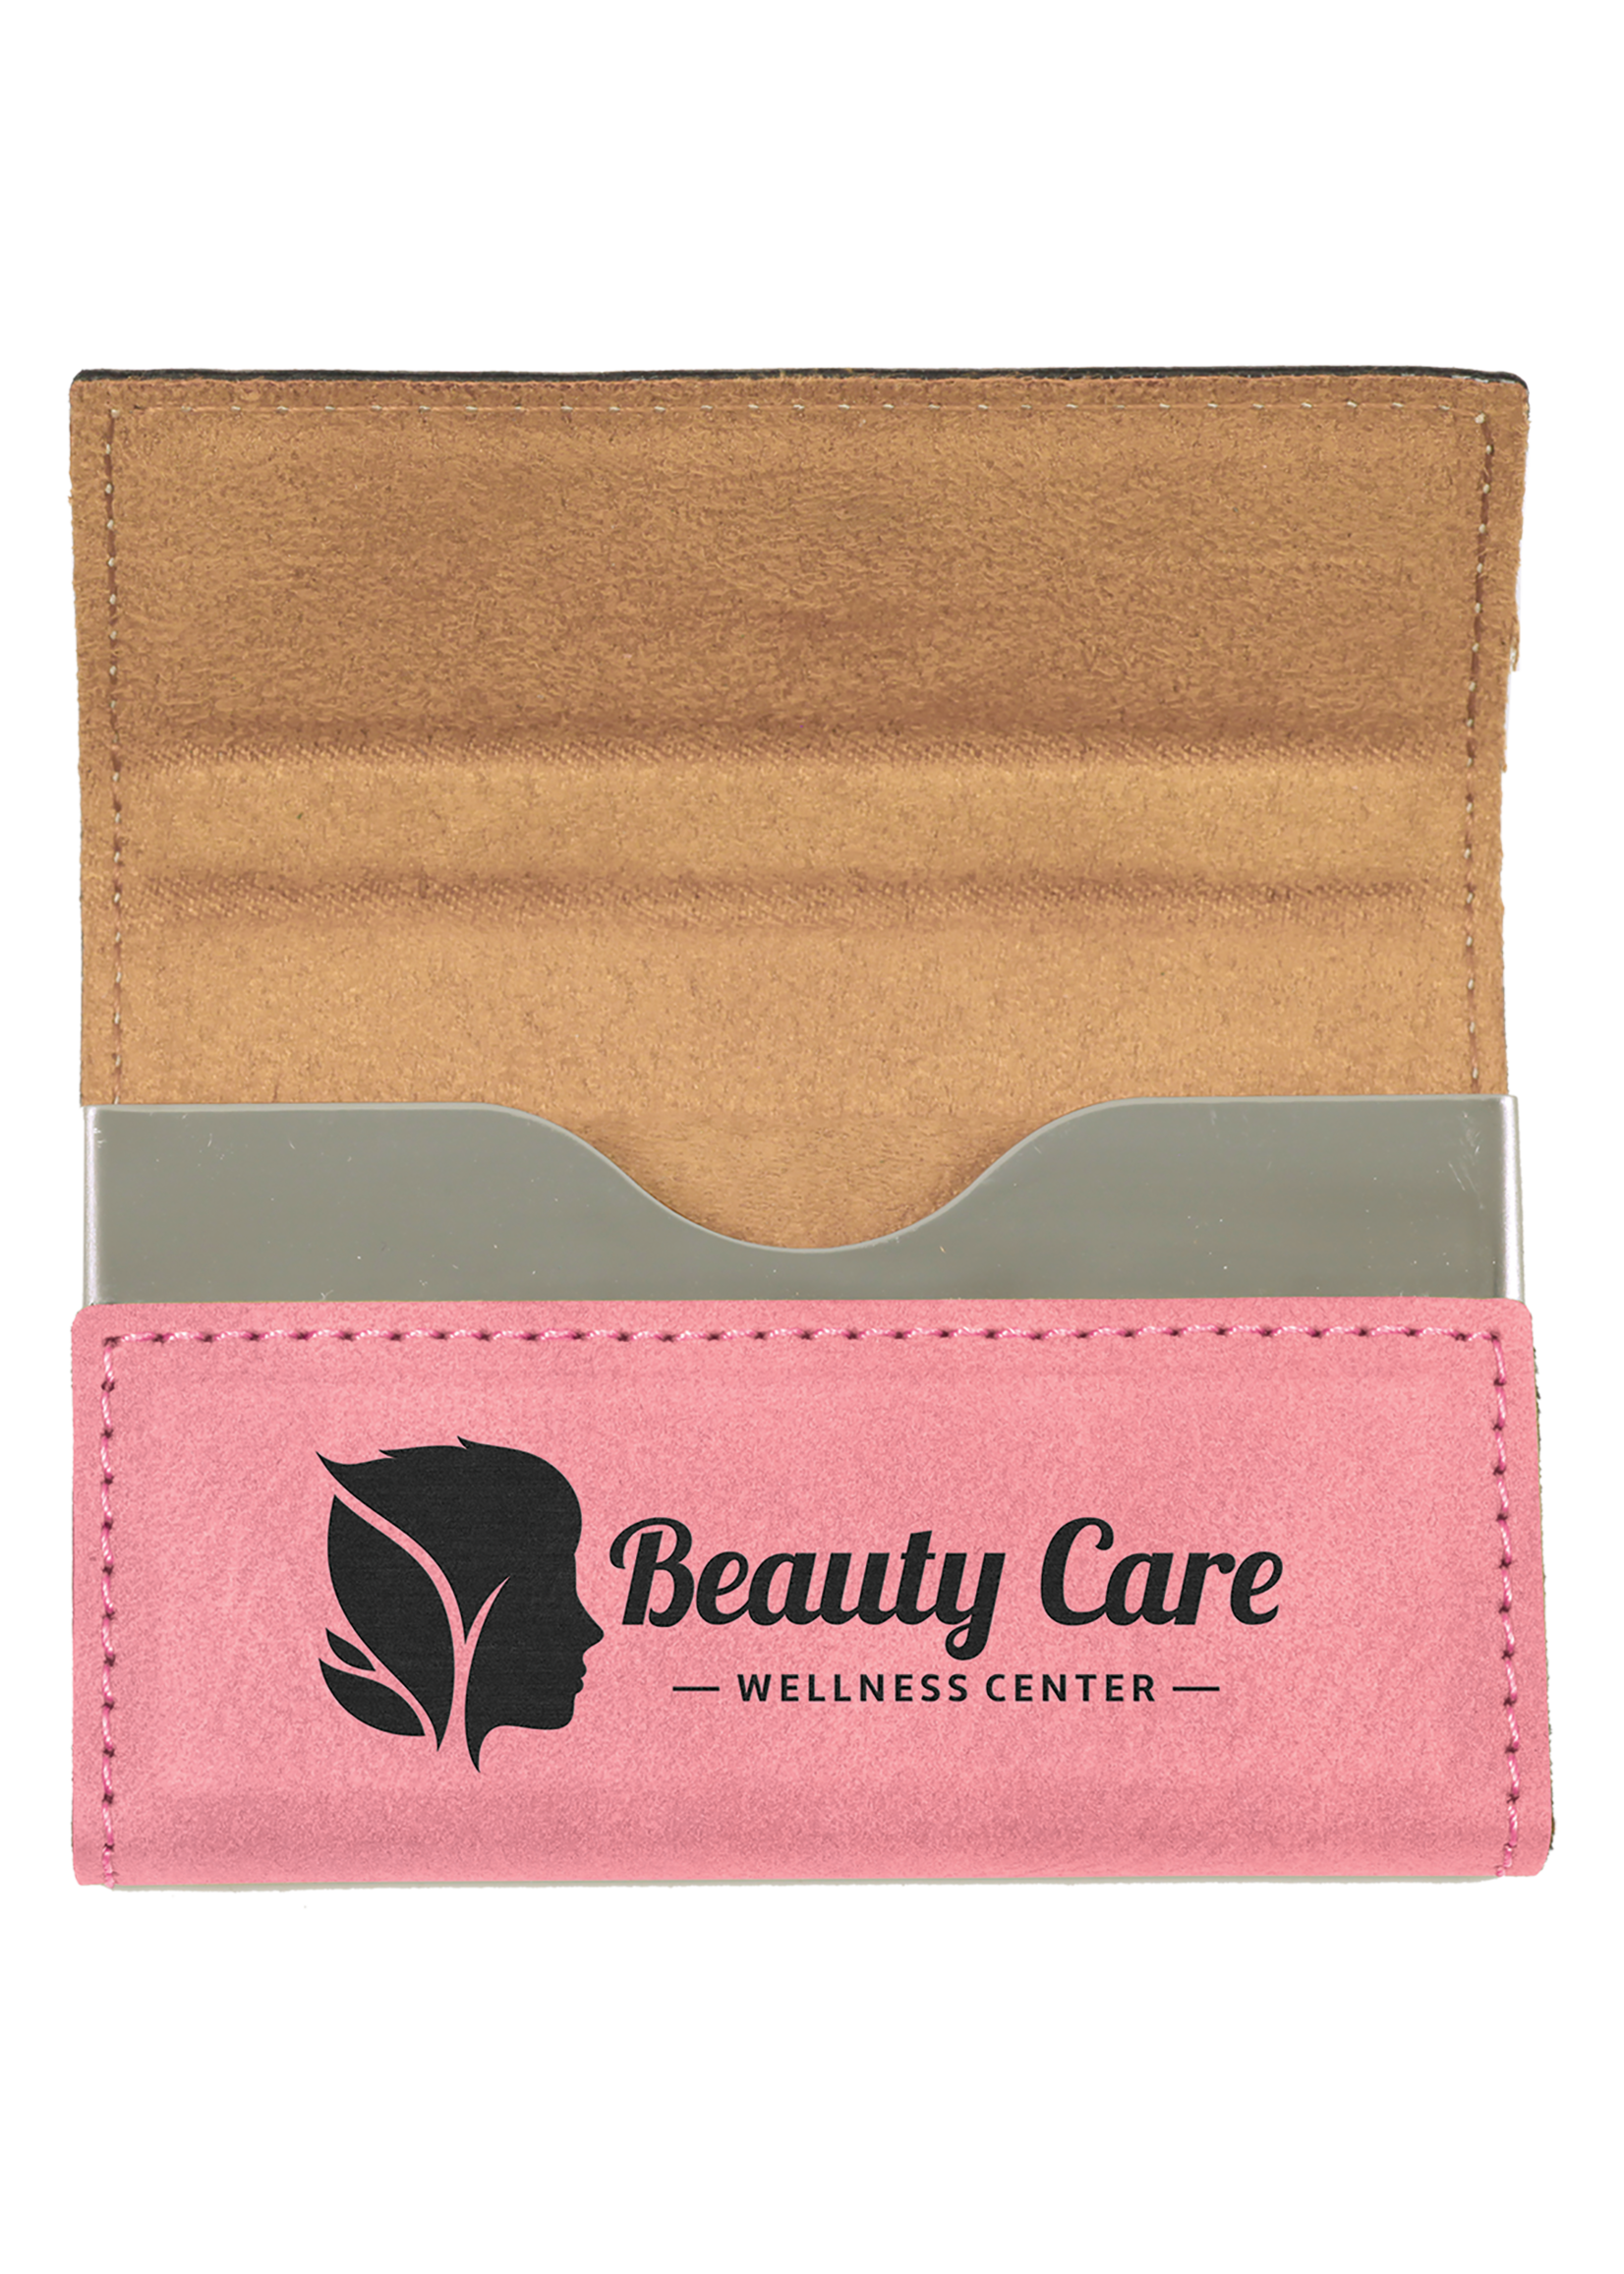 Leatherette Business Card Holder Hard